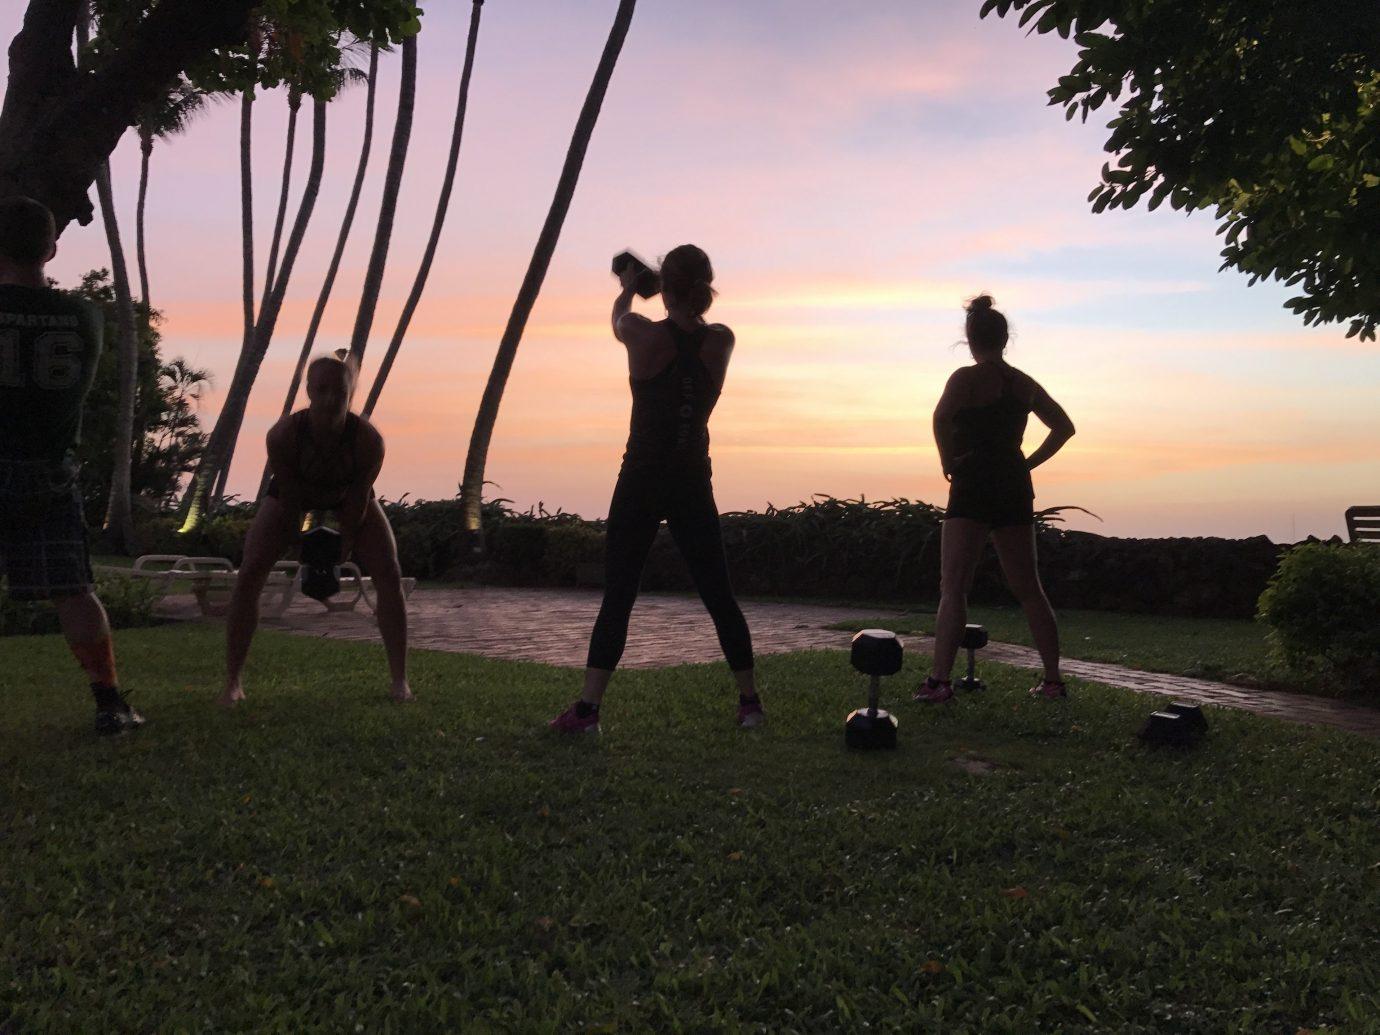 Health + Wellness Meditation Retreats Trip Ideas Yoga Retreats outdoor grass sky tree Sunset sunlight silhouette